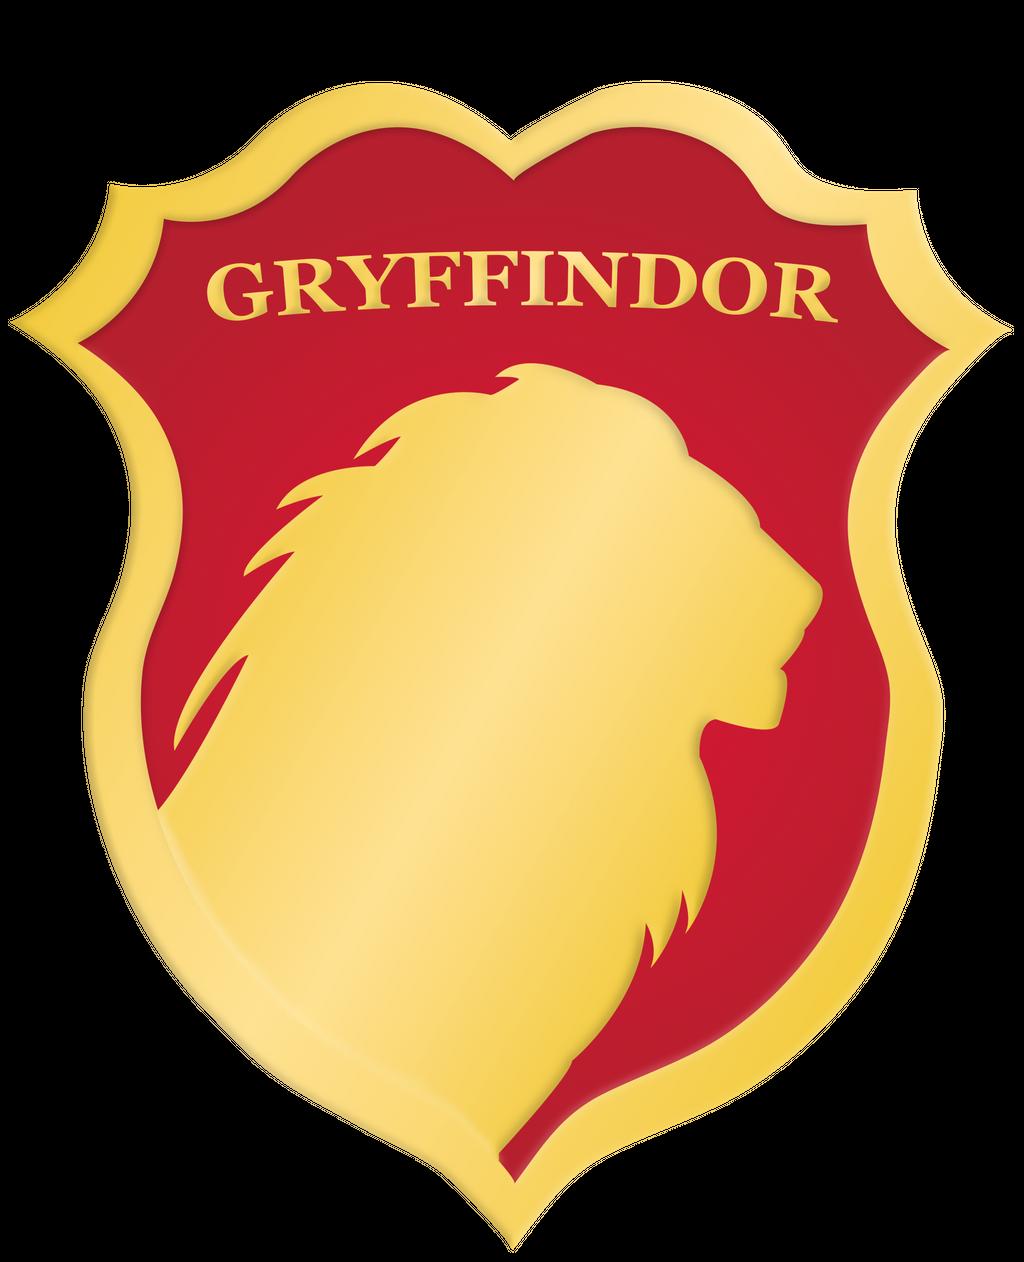 Gryffindor Crest Badge By Rainbowrenly On Deviantart Gryffindor Crest Gryffindor Harry Potter Canvas